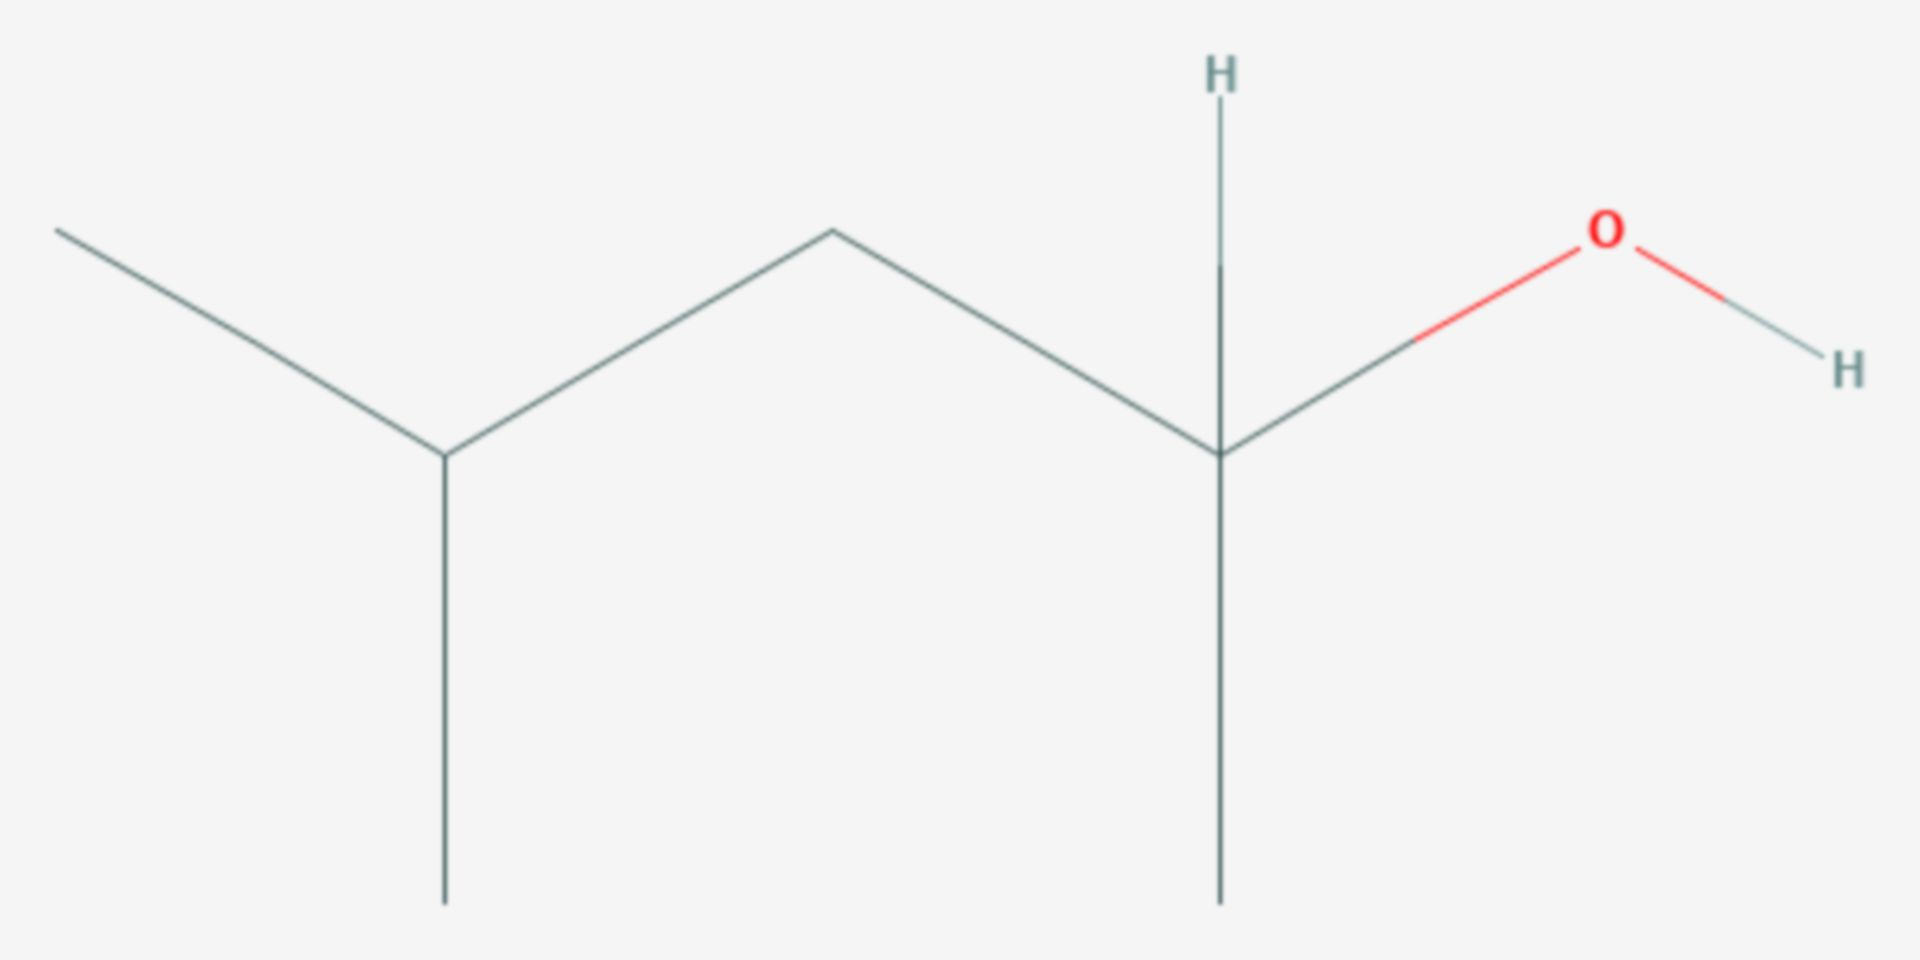 4-Methyl-2-pentanol (Strukturformel)